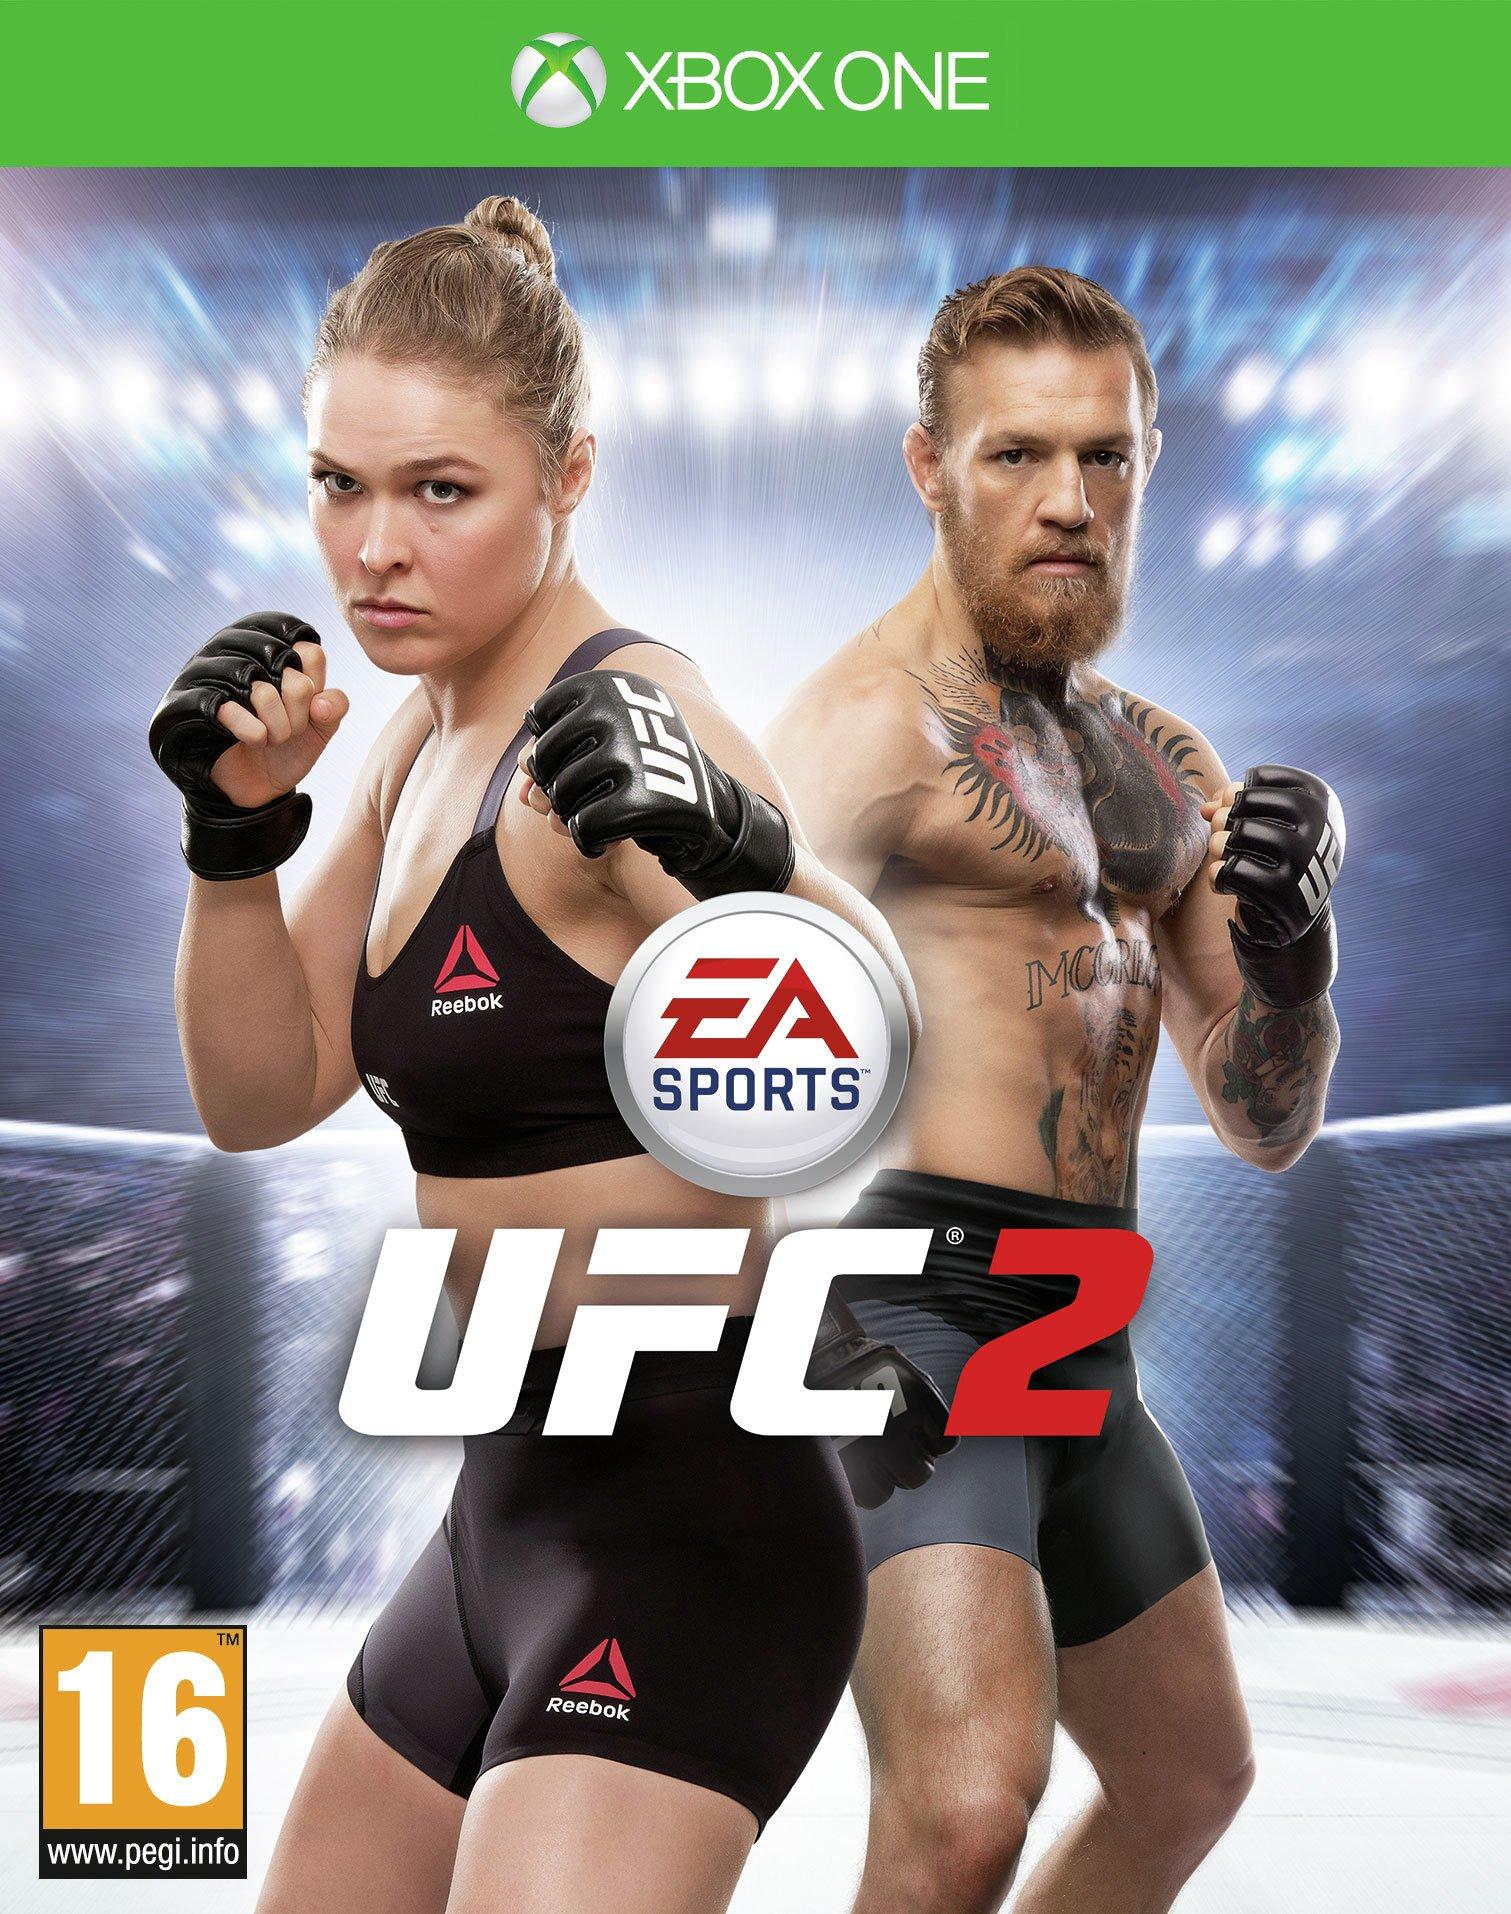 Ea sports ufc EA Sports UFC 2 - Xbox - One Game.